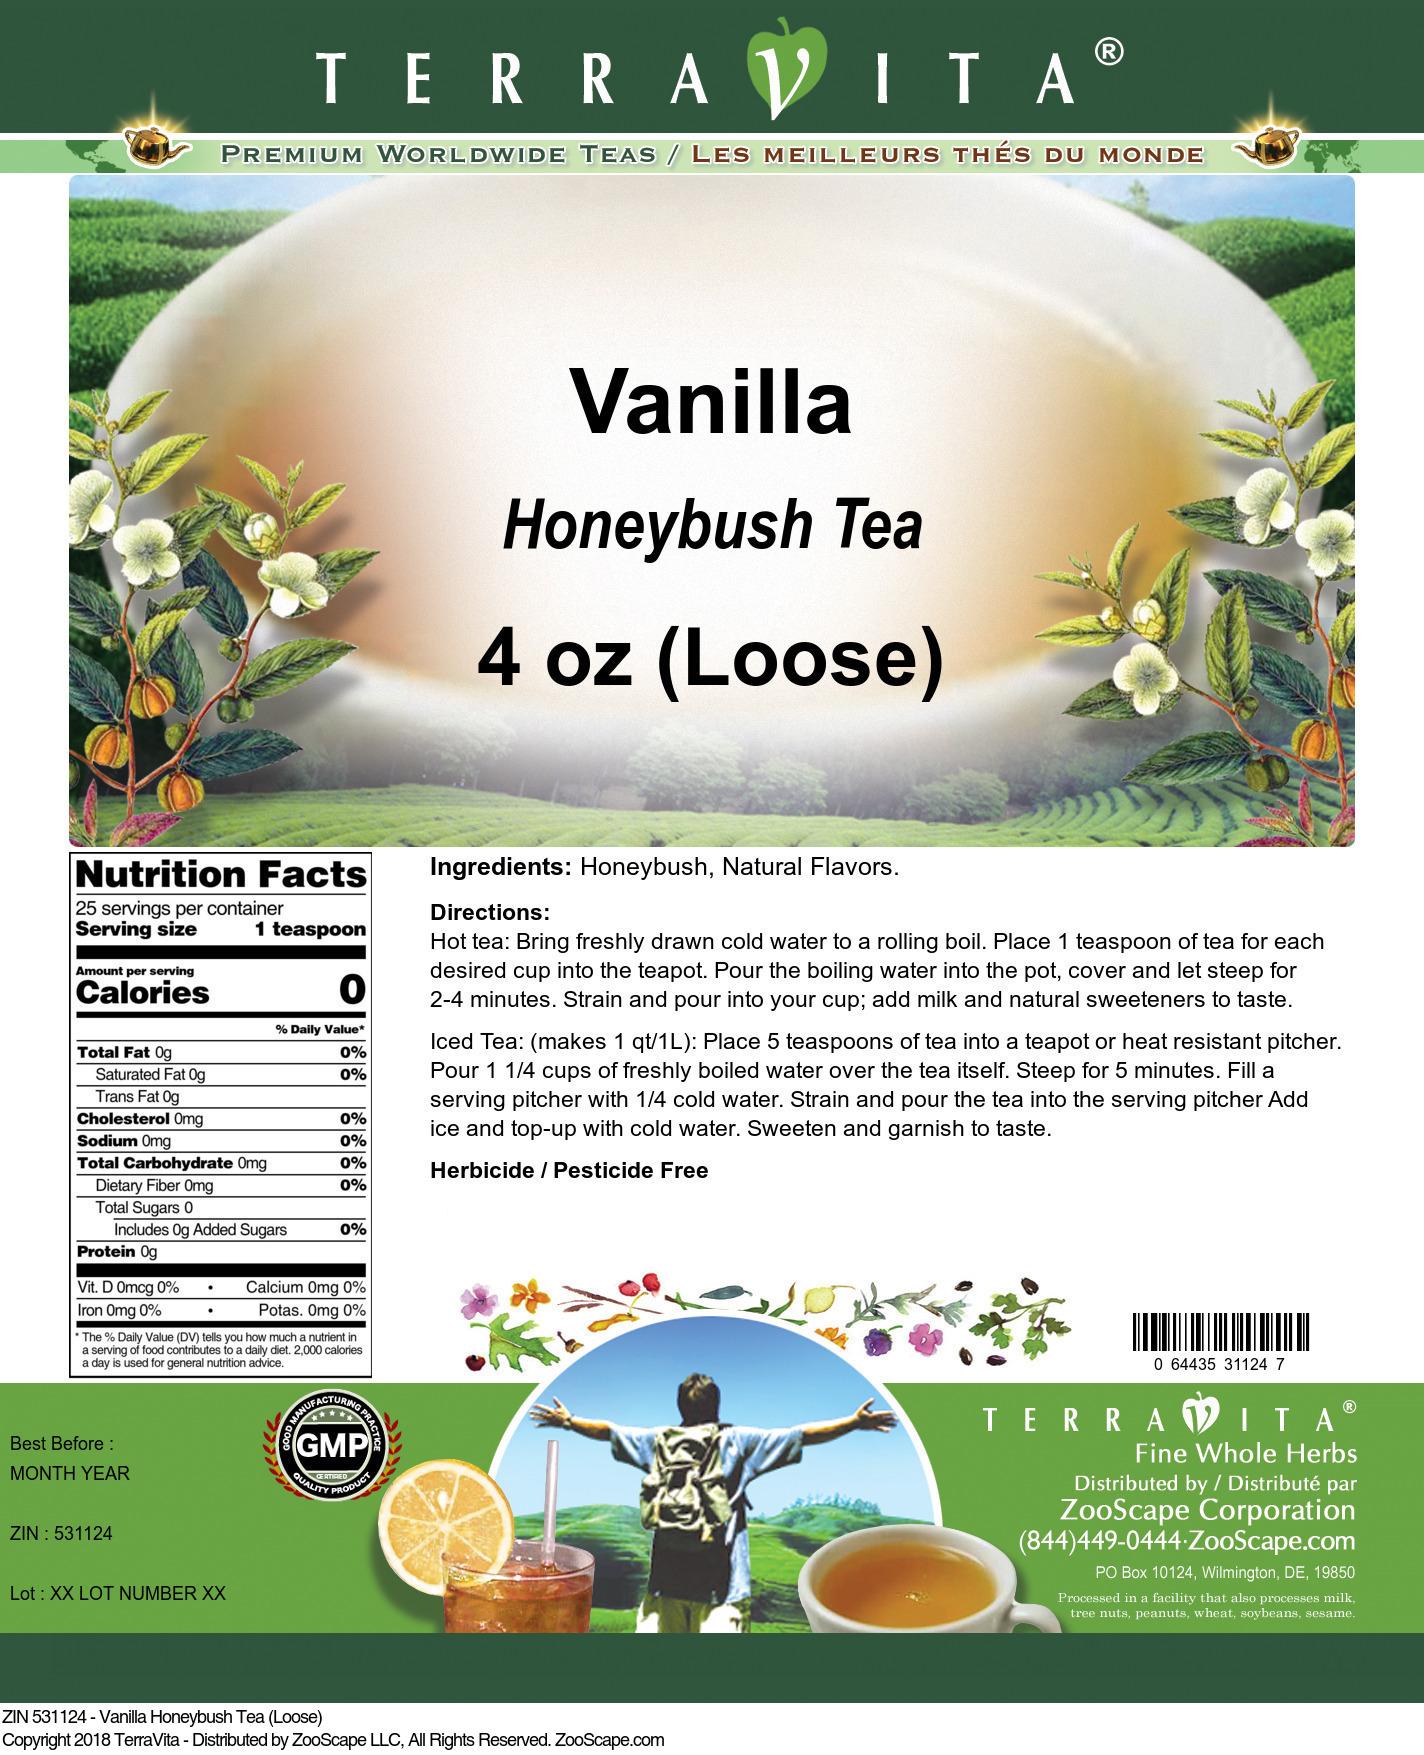 Vanilla Honeybush Tea (Loose)